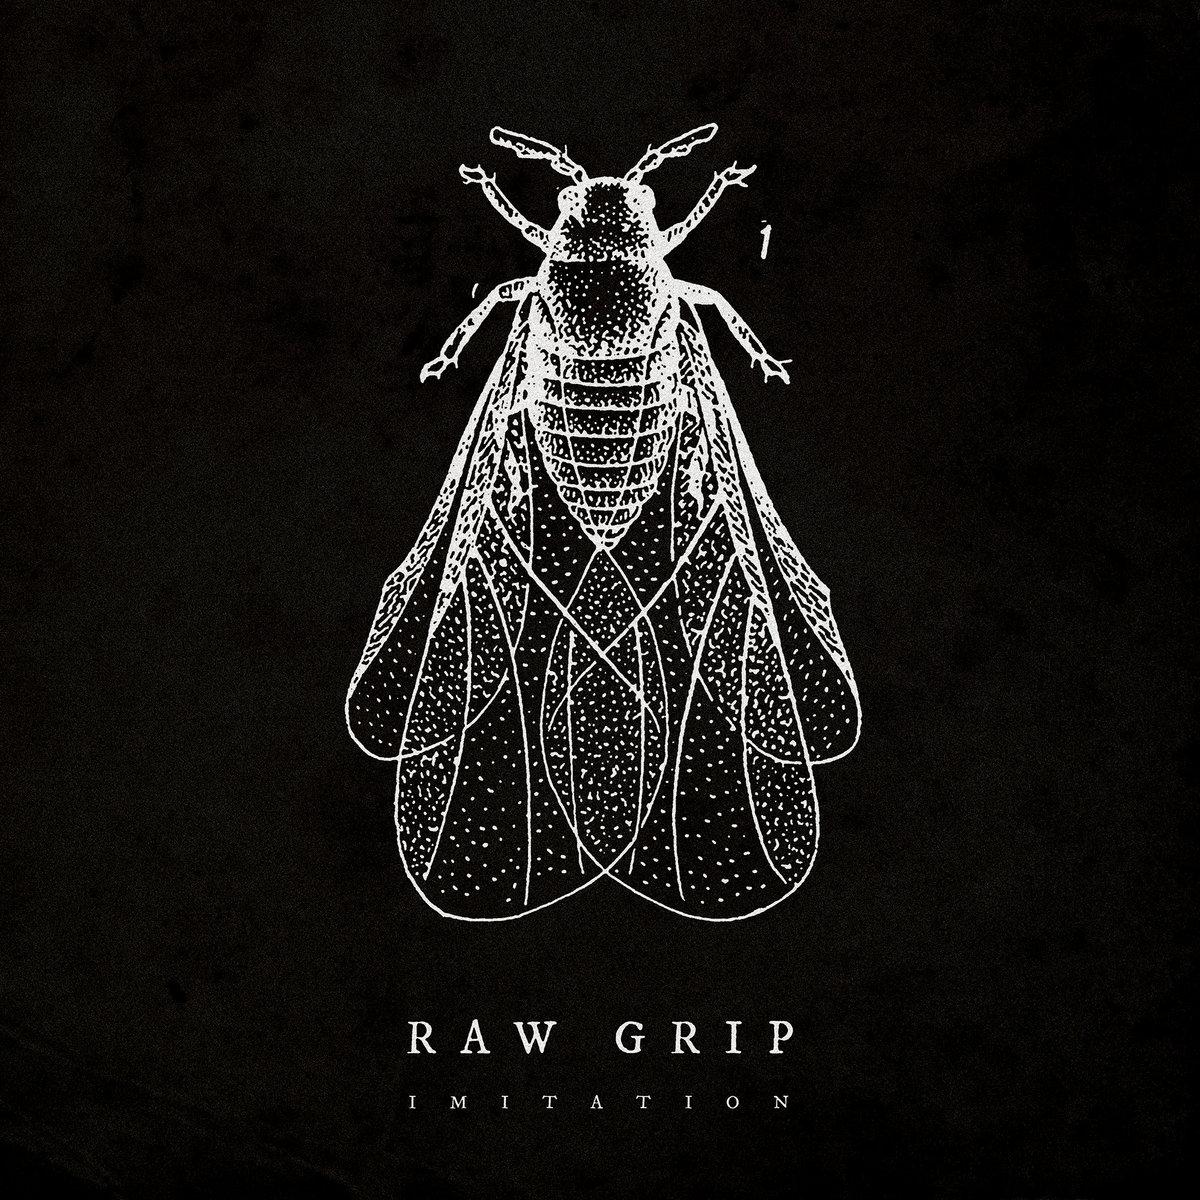 Raw Grip — Imitation